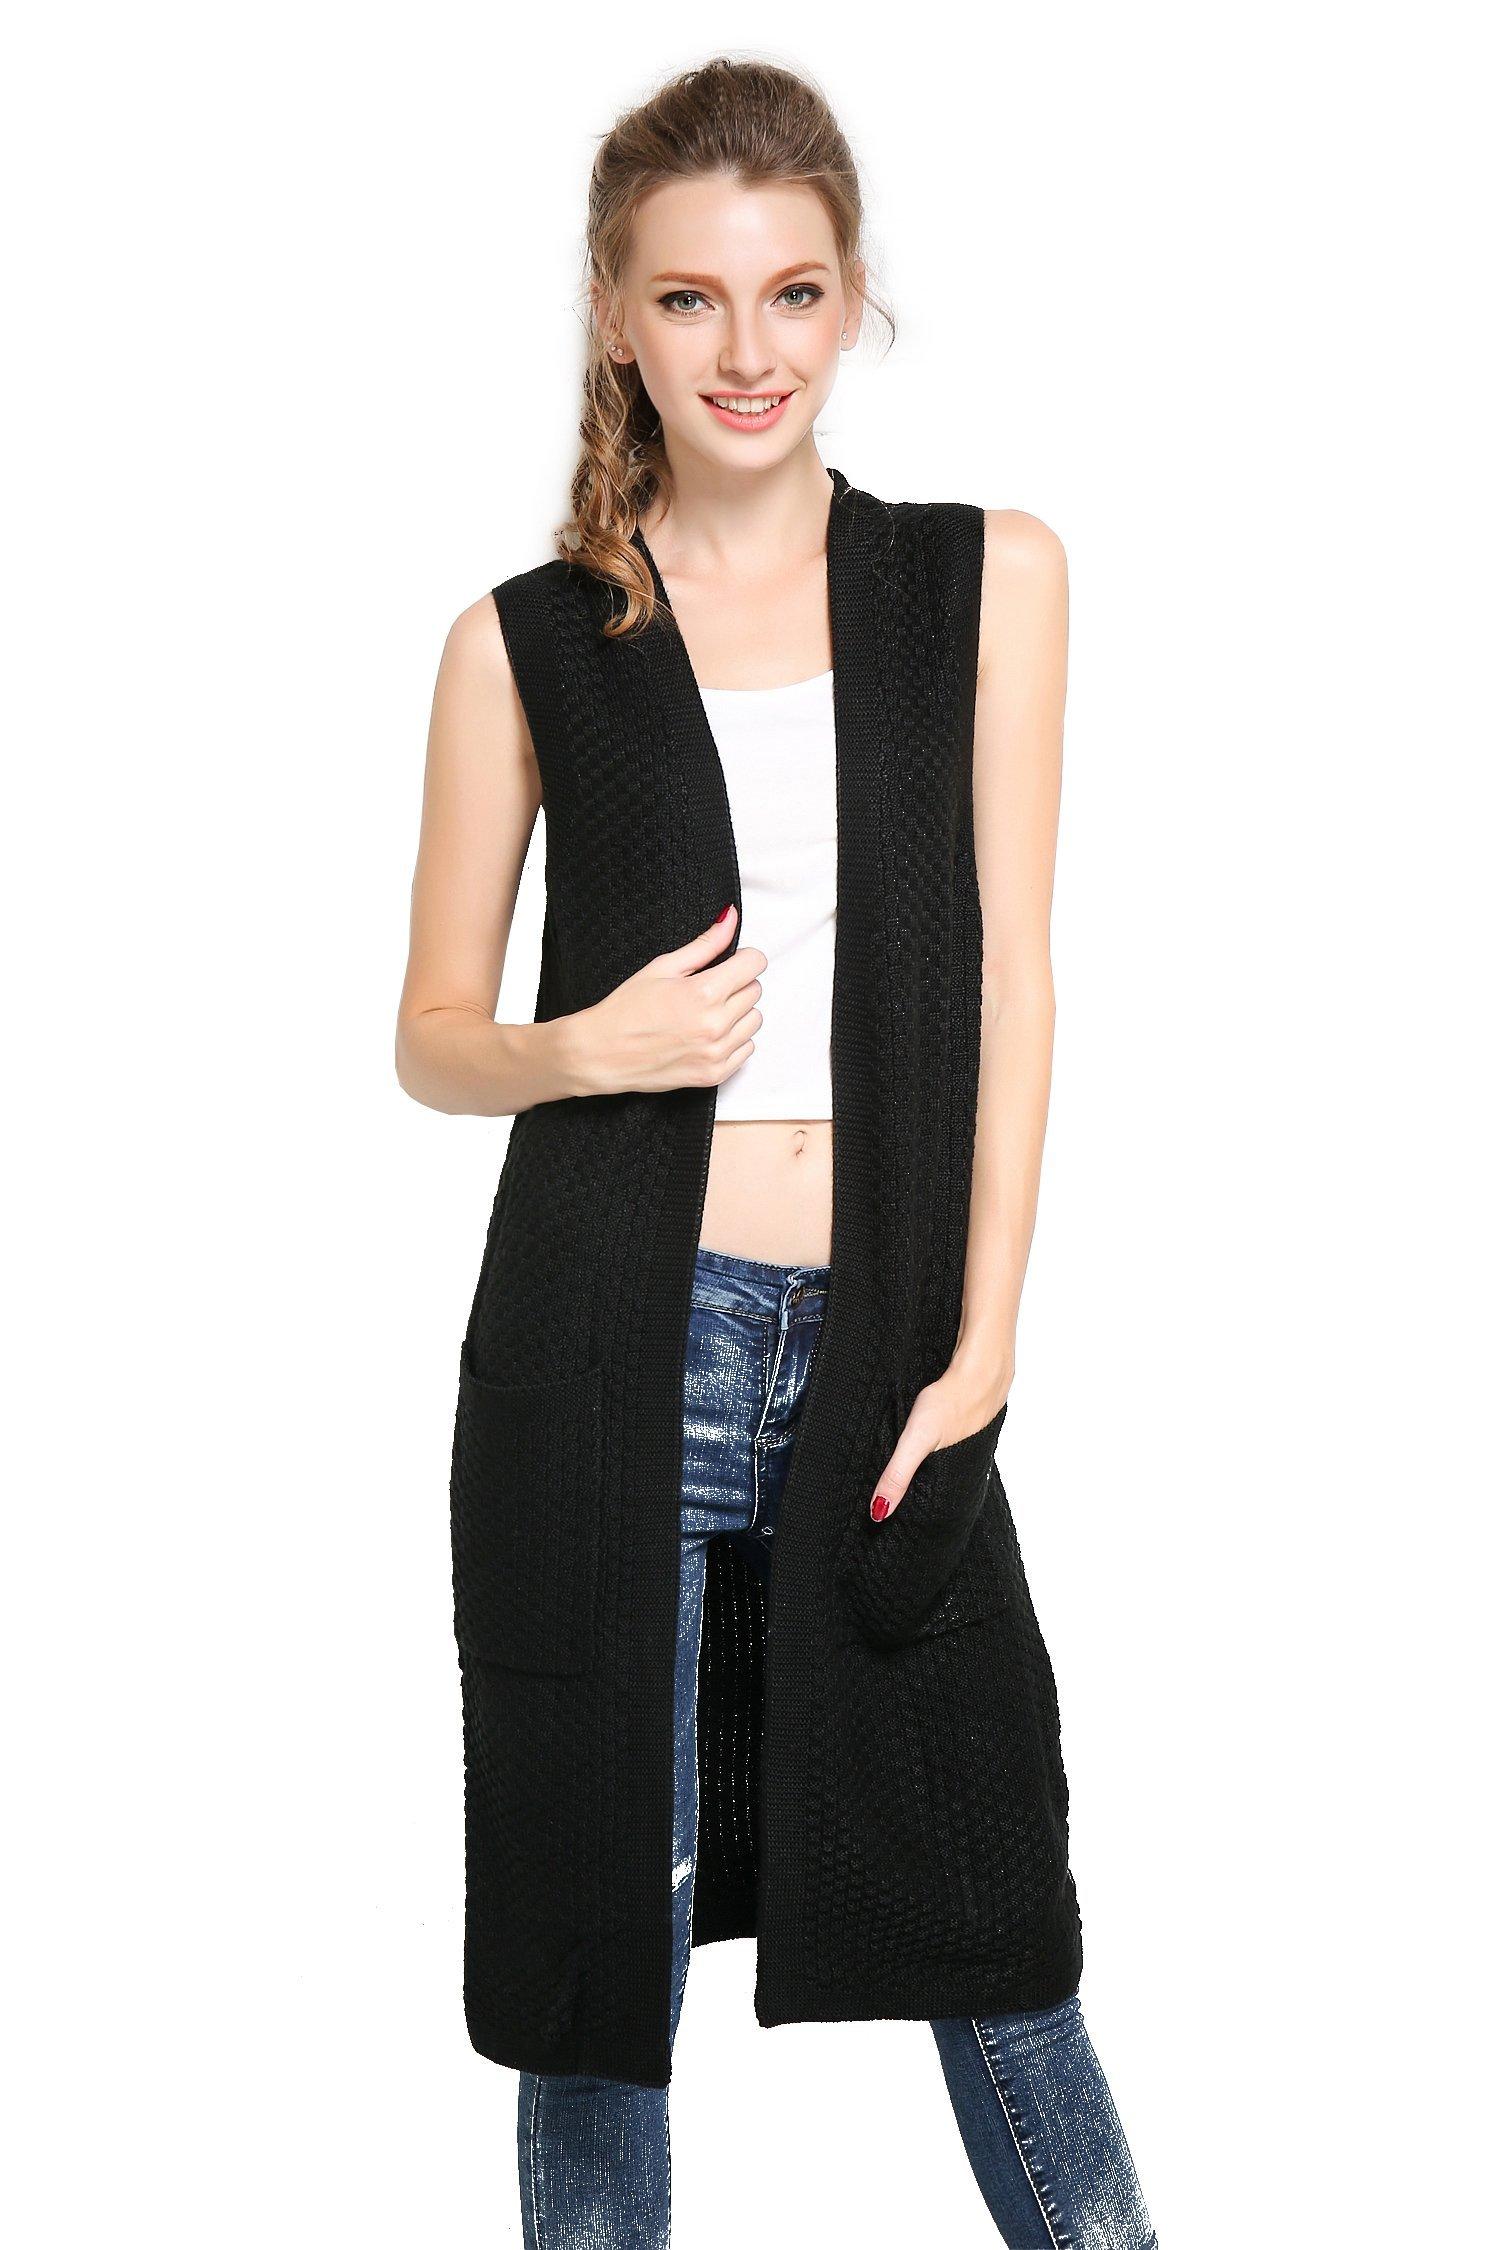 Roshe's Boutique Women's Pockets Long Sweater Vest Cardigan,Black,Small